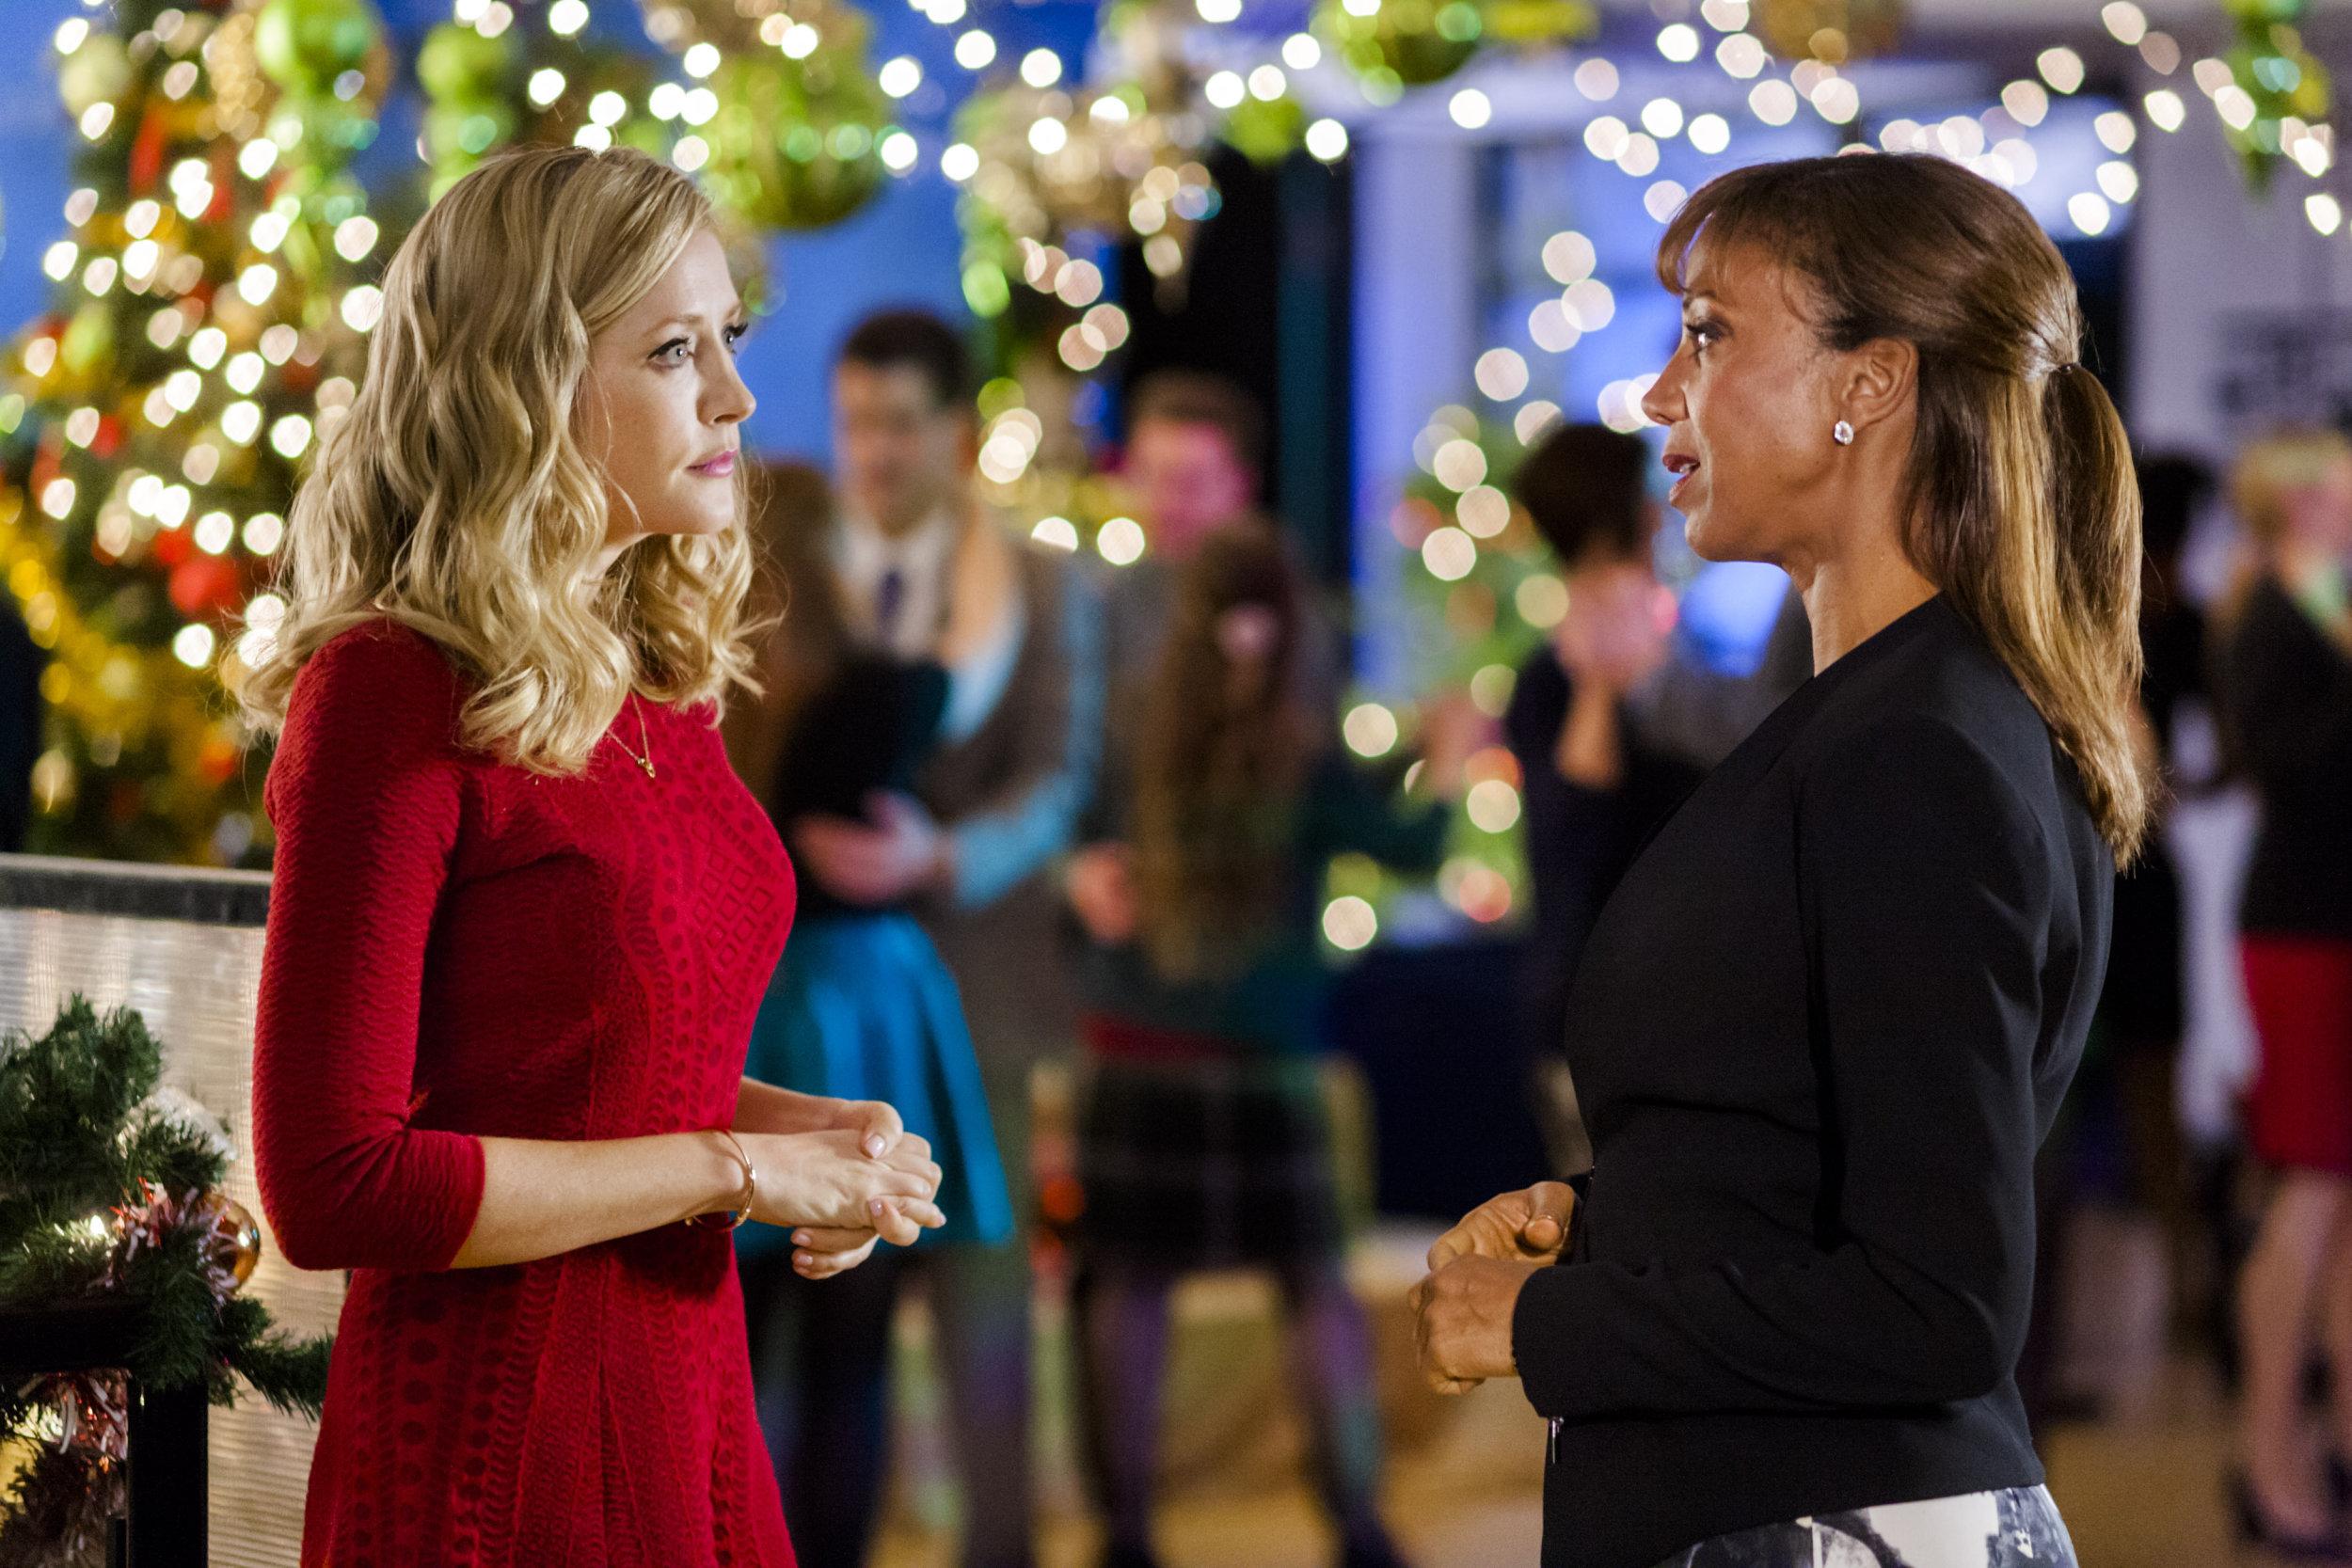 cast angel of christmas hallmark movies and mysteries - Hallmark Christmas 2015